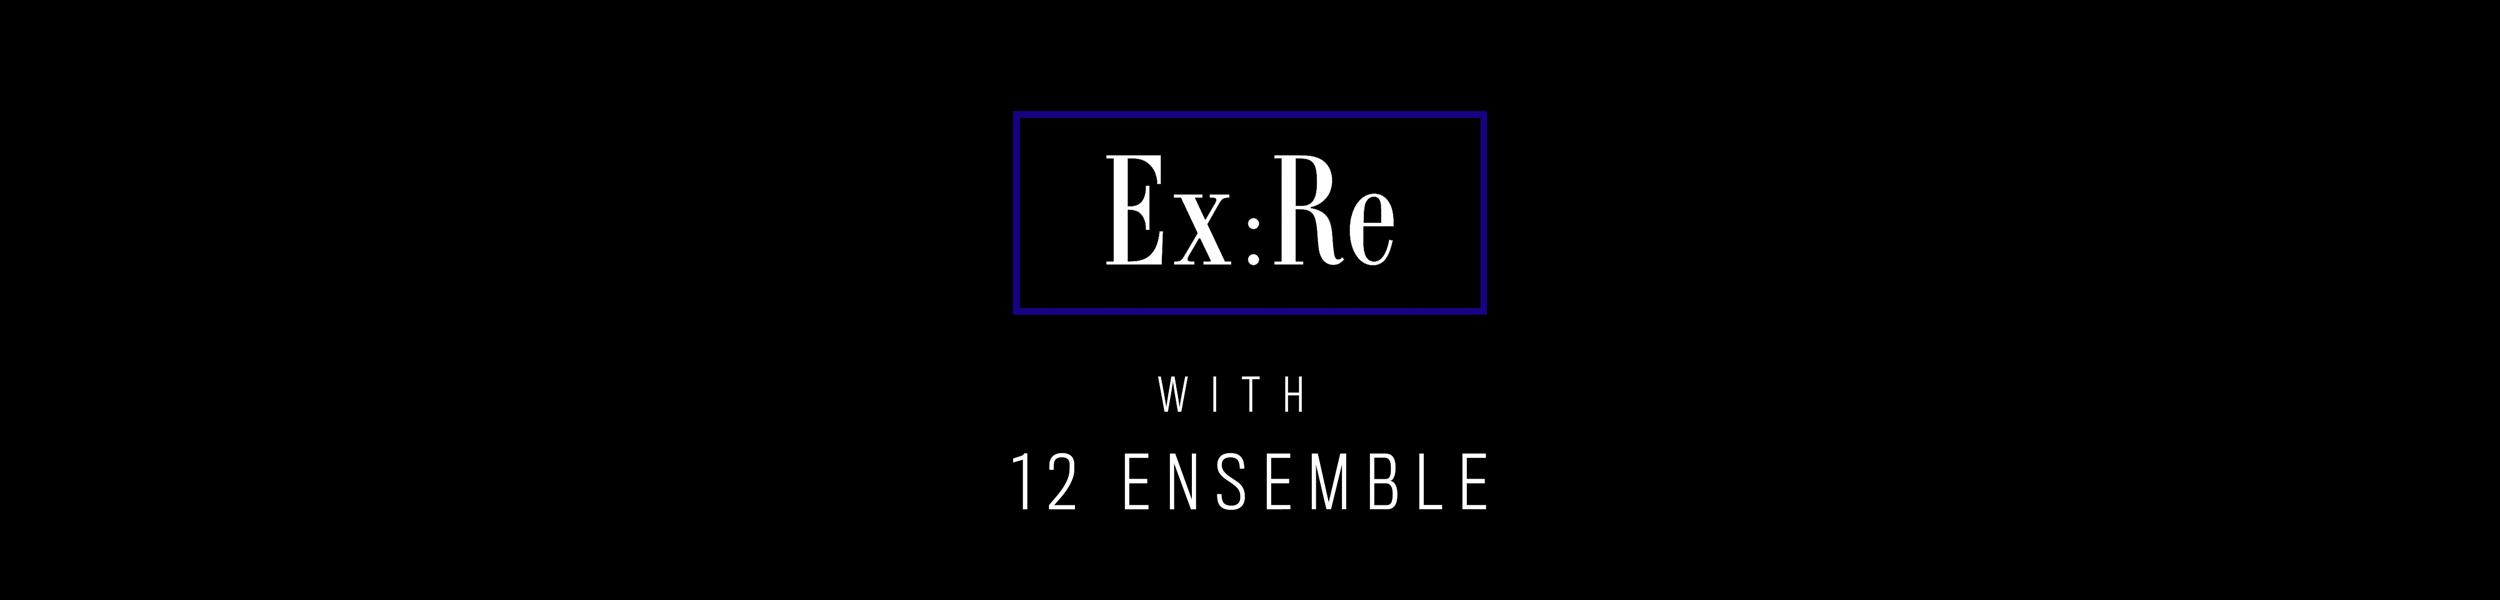 Ex:Re - Ex:Re with 12 Ensemble